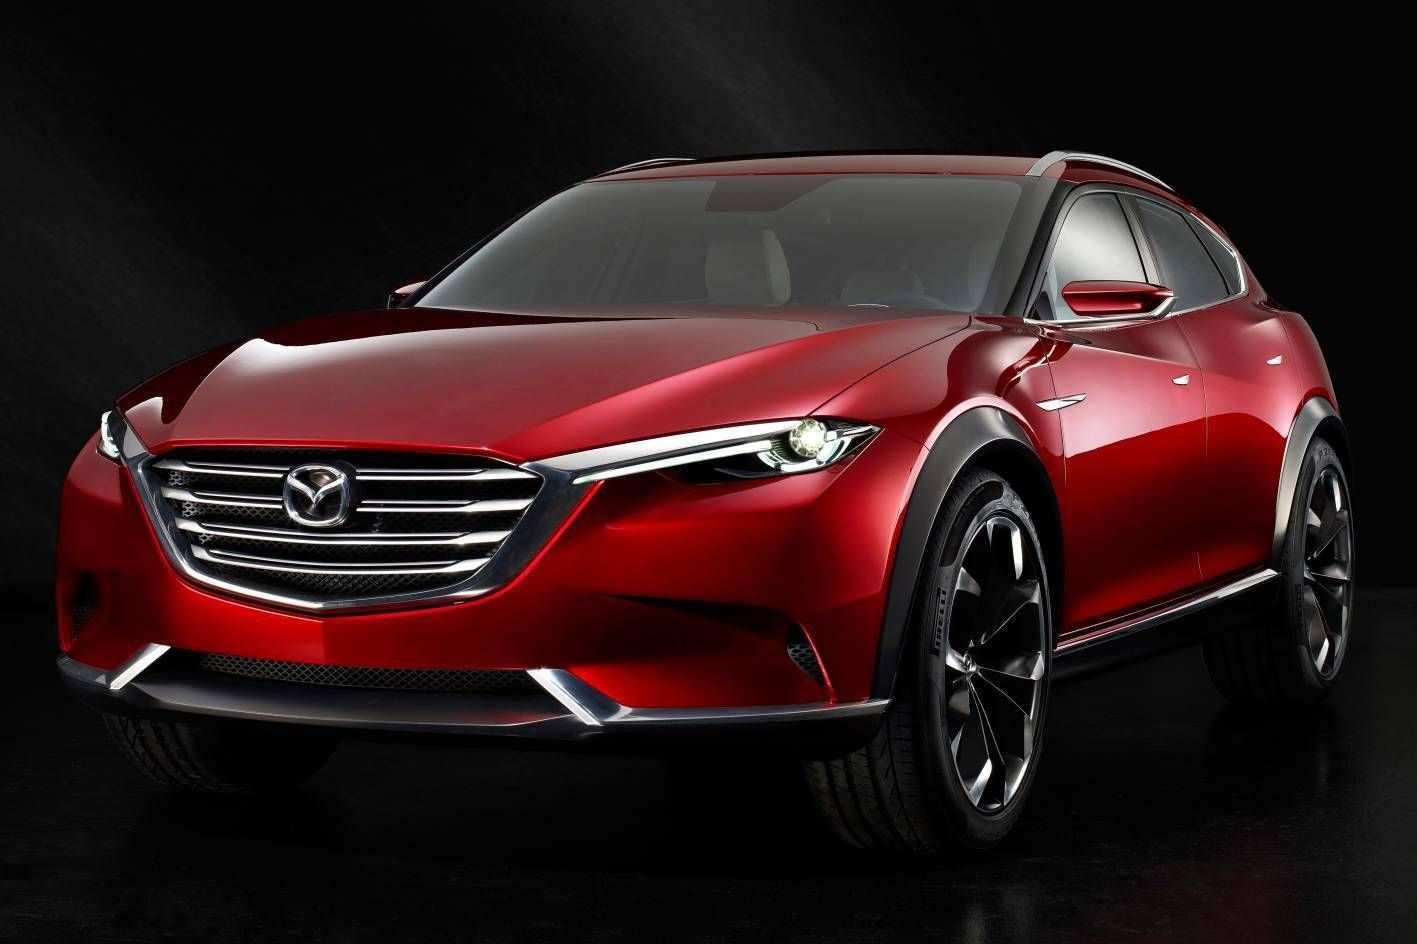 30 The 2020 Mazda Cx 9 Rumors Research New for 2020 Mazda Cx 9 Rumors